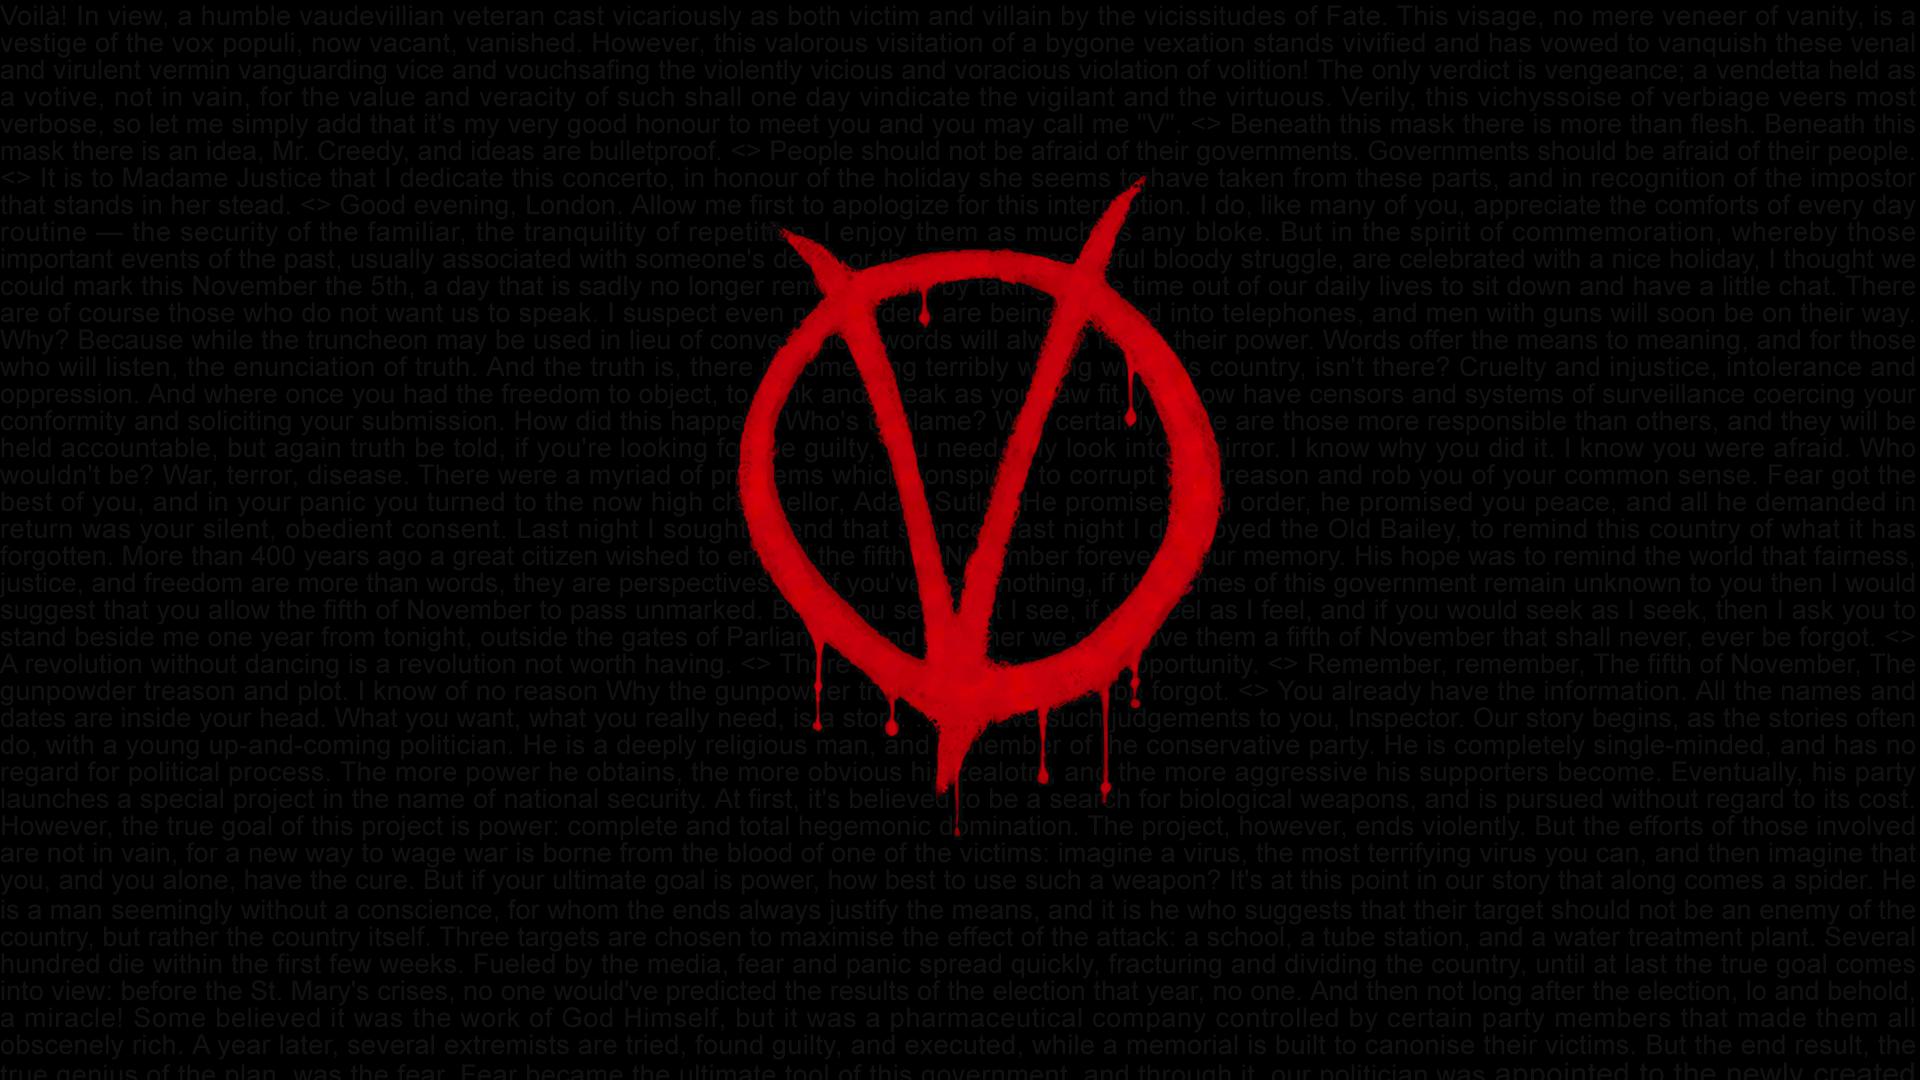 V For Vendetta Remember Rhyme Stretched Canvas ~ More Size